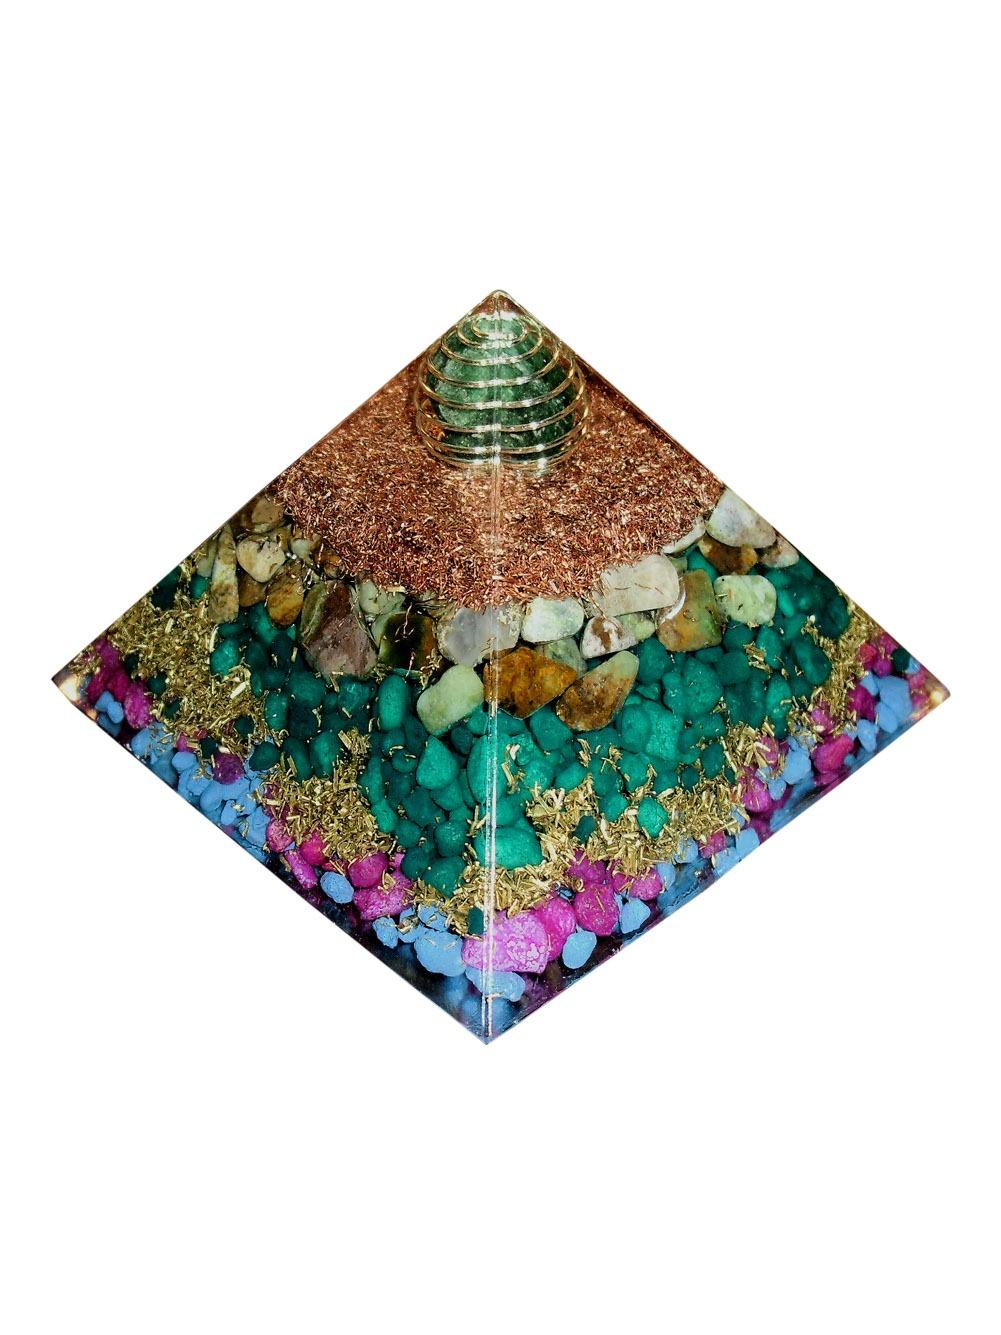 Globe Top Orgone Pyramid